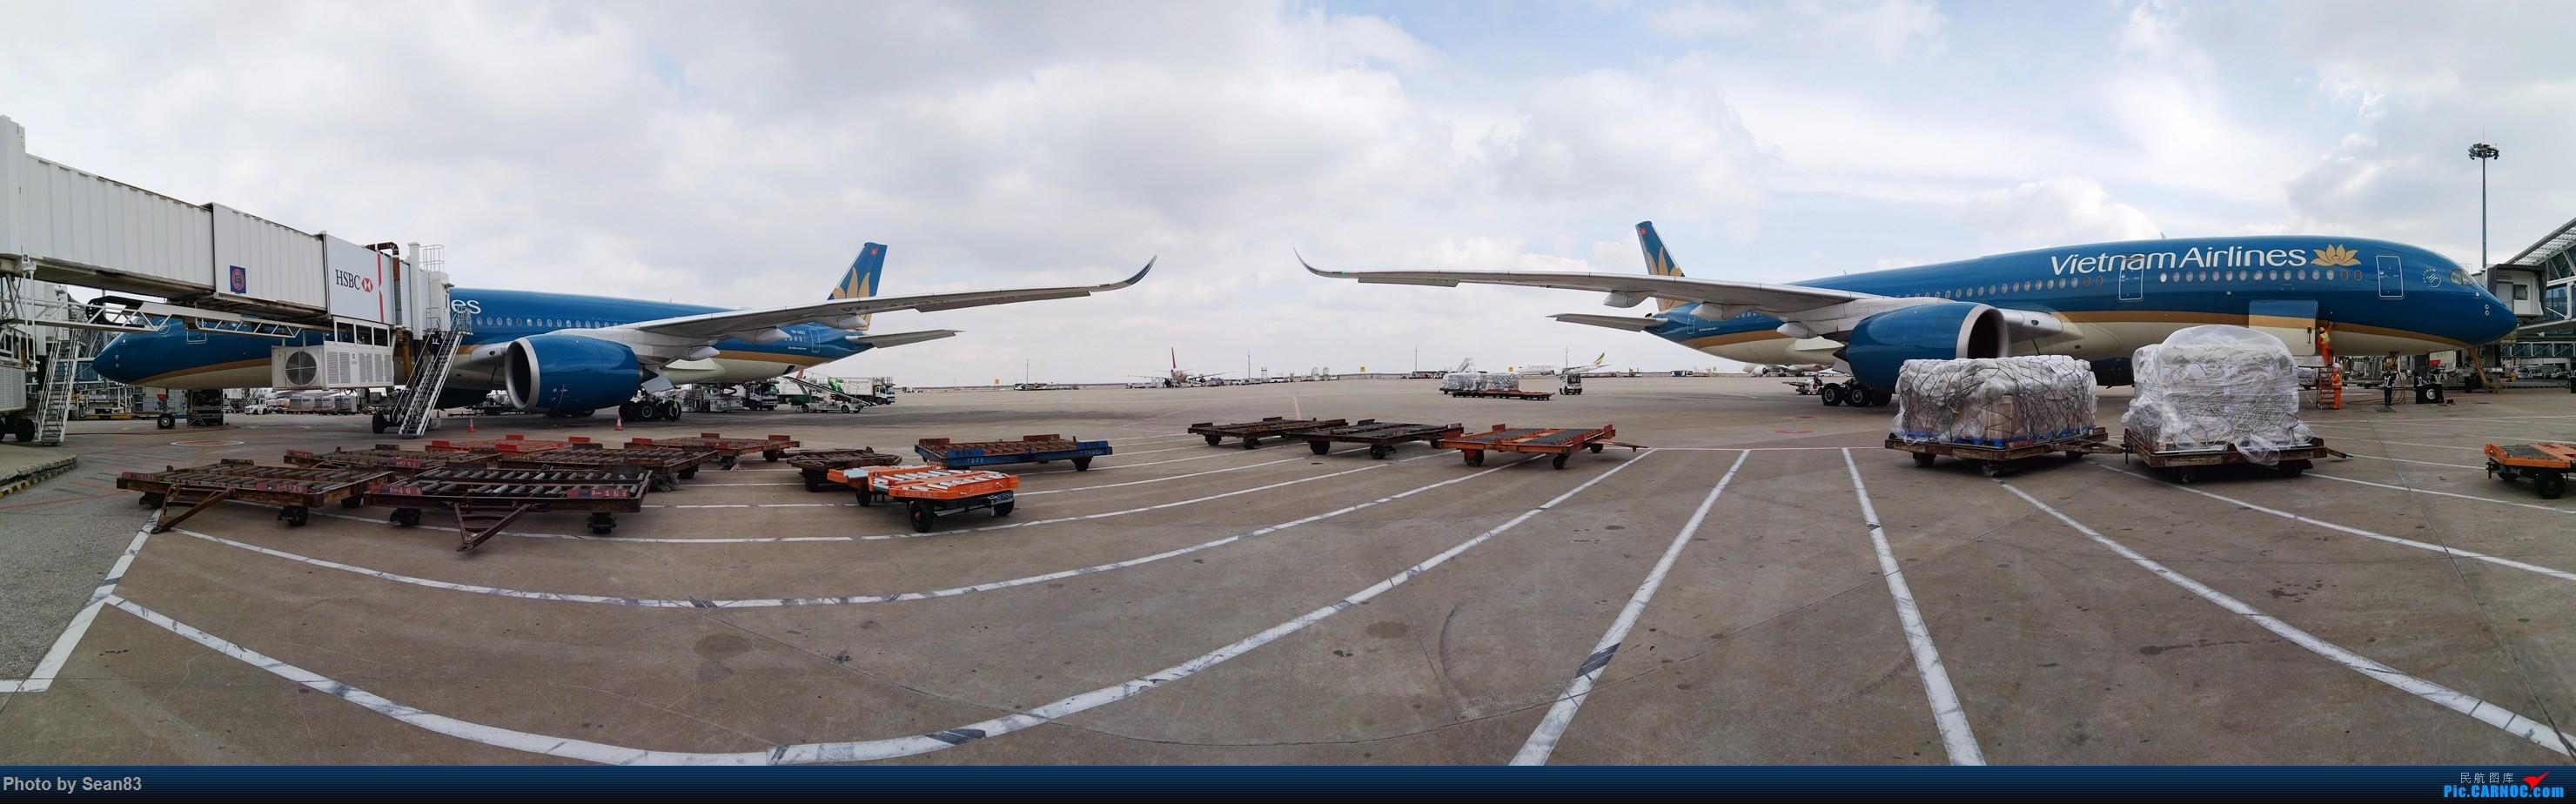 Re:[原创][PVG] 严冬苦寒也不忘拍机,上一张A350 AIRBUS A350-900  中国上海浦东国际机场